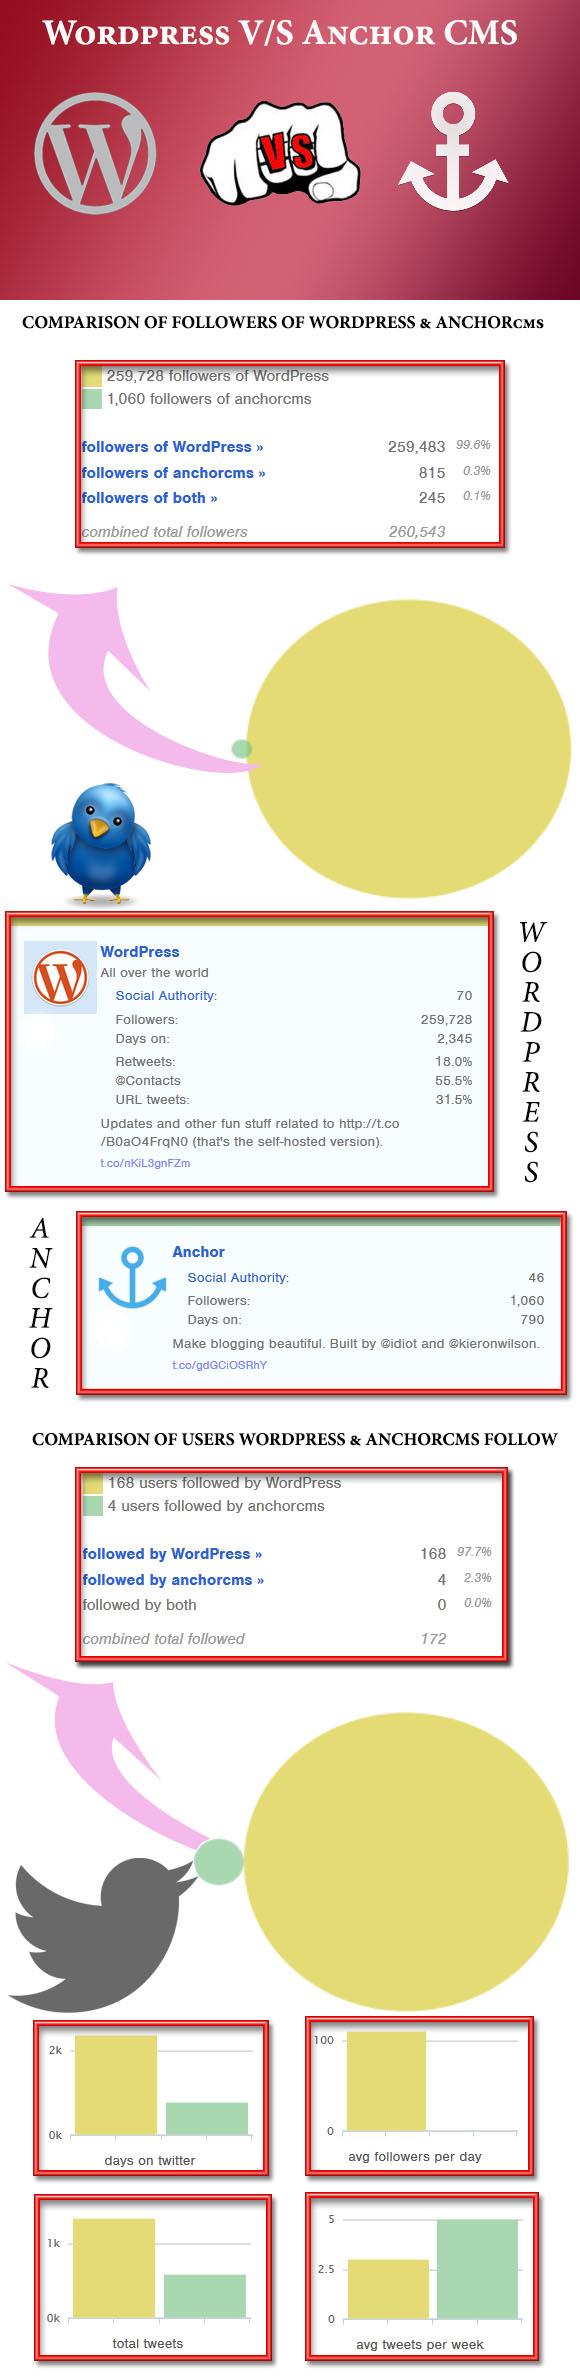 Wordpress-vs-Anchor-cms-infographic